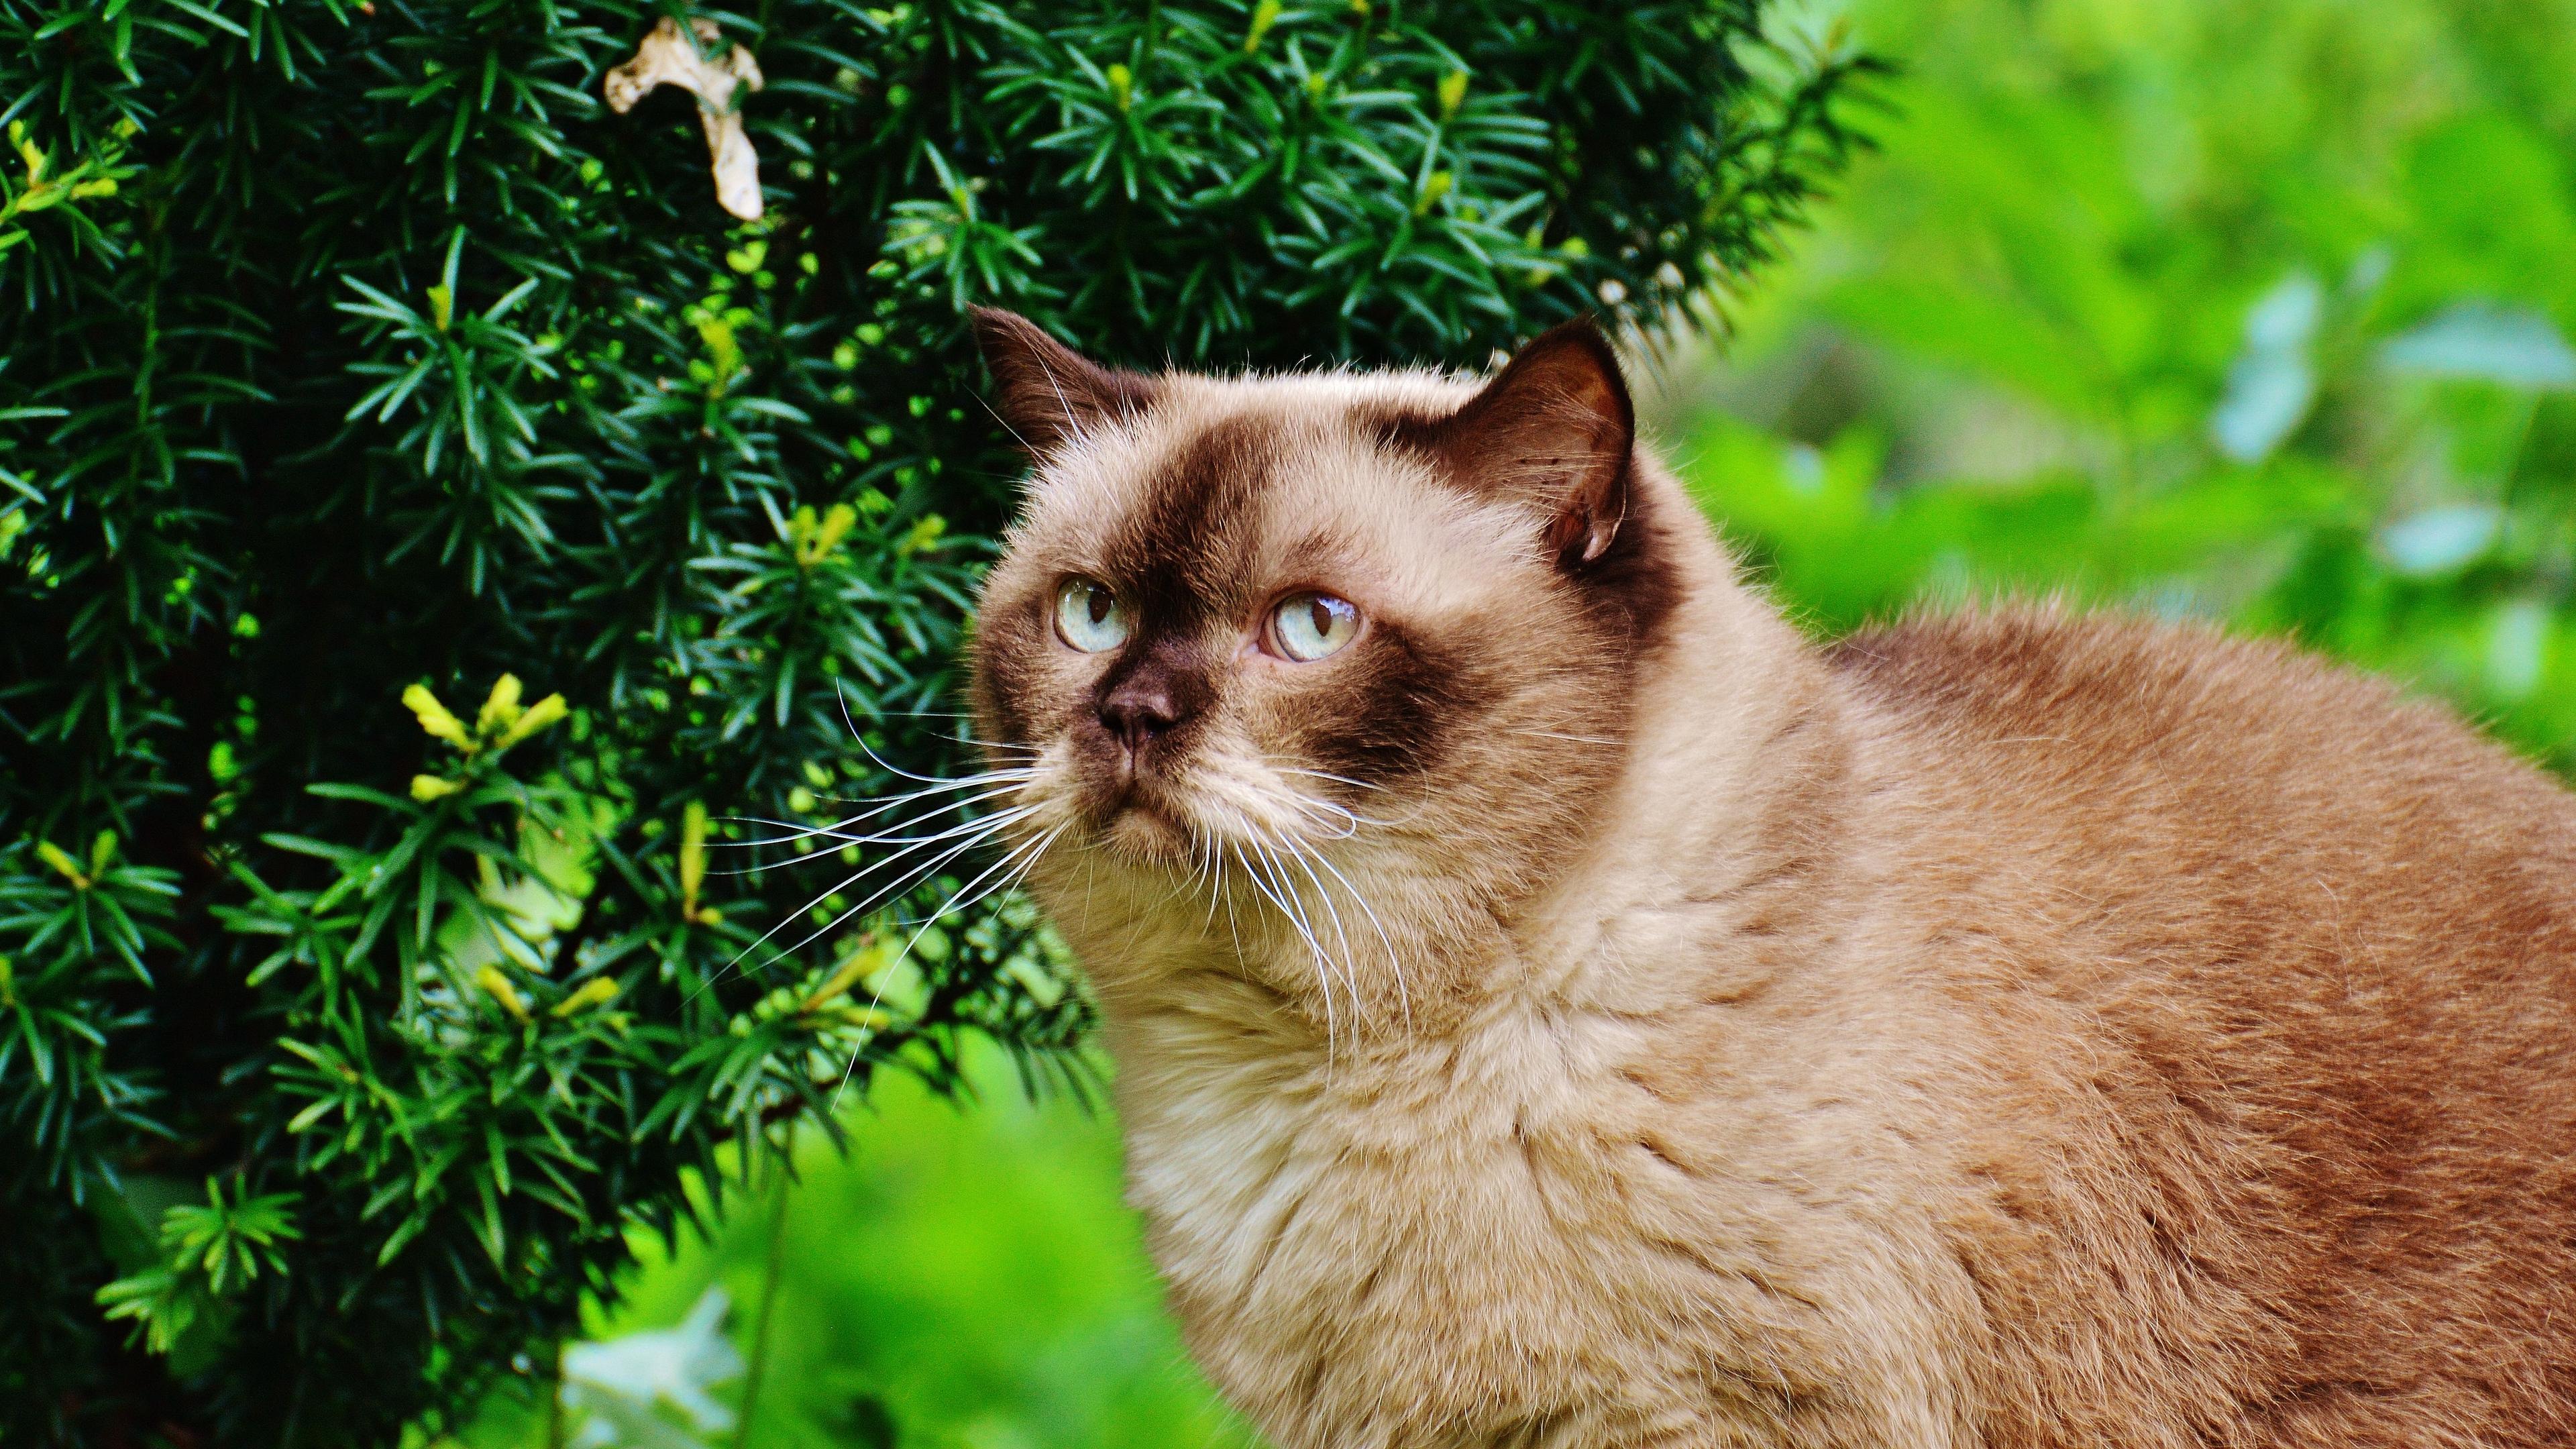 british shorthair cat cat branches 4k 1542242197 - british shorthair cat, cat, branches 4k - Cat, british shorthair cat, branches